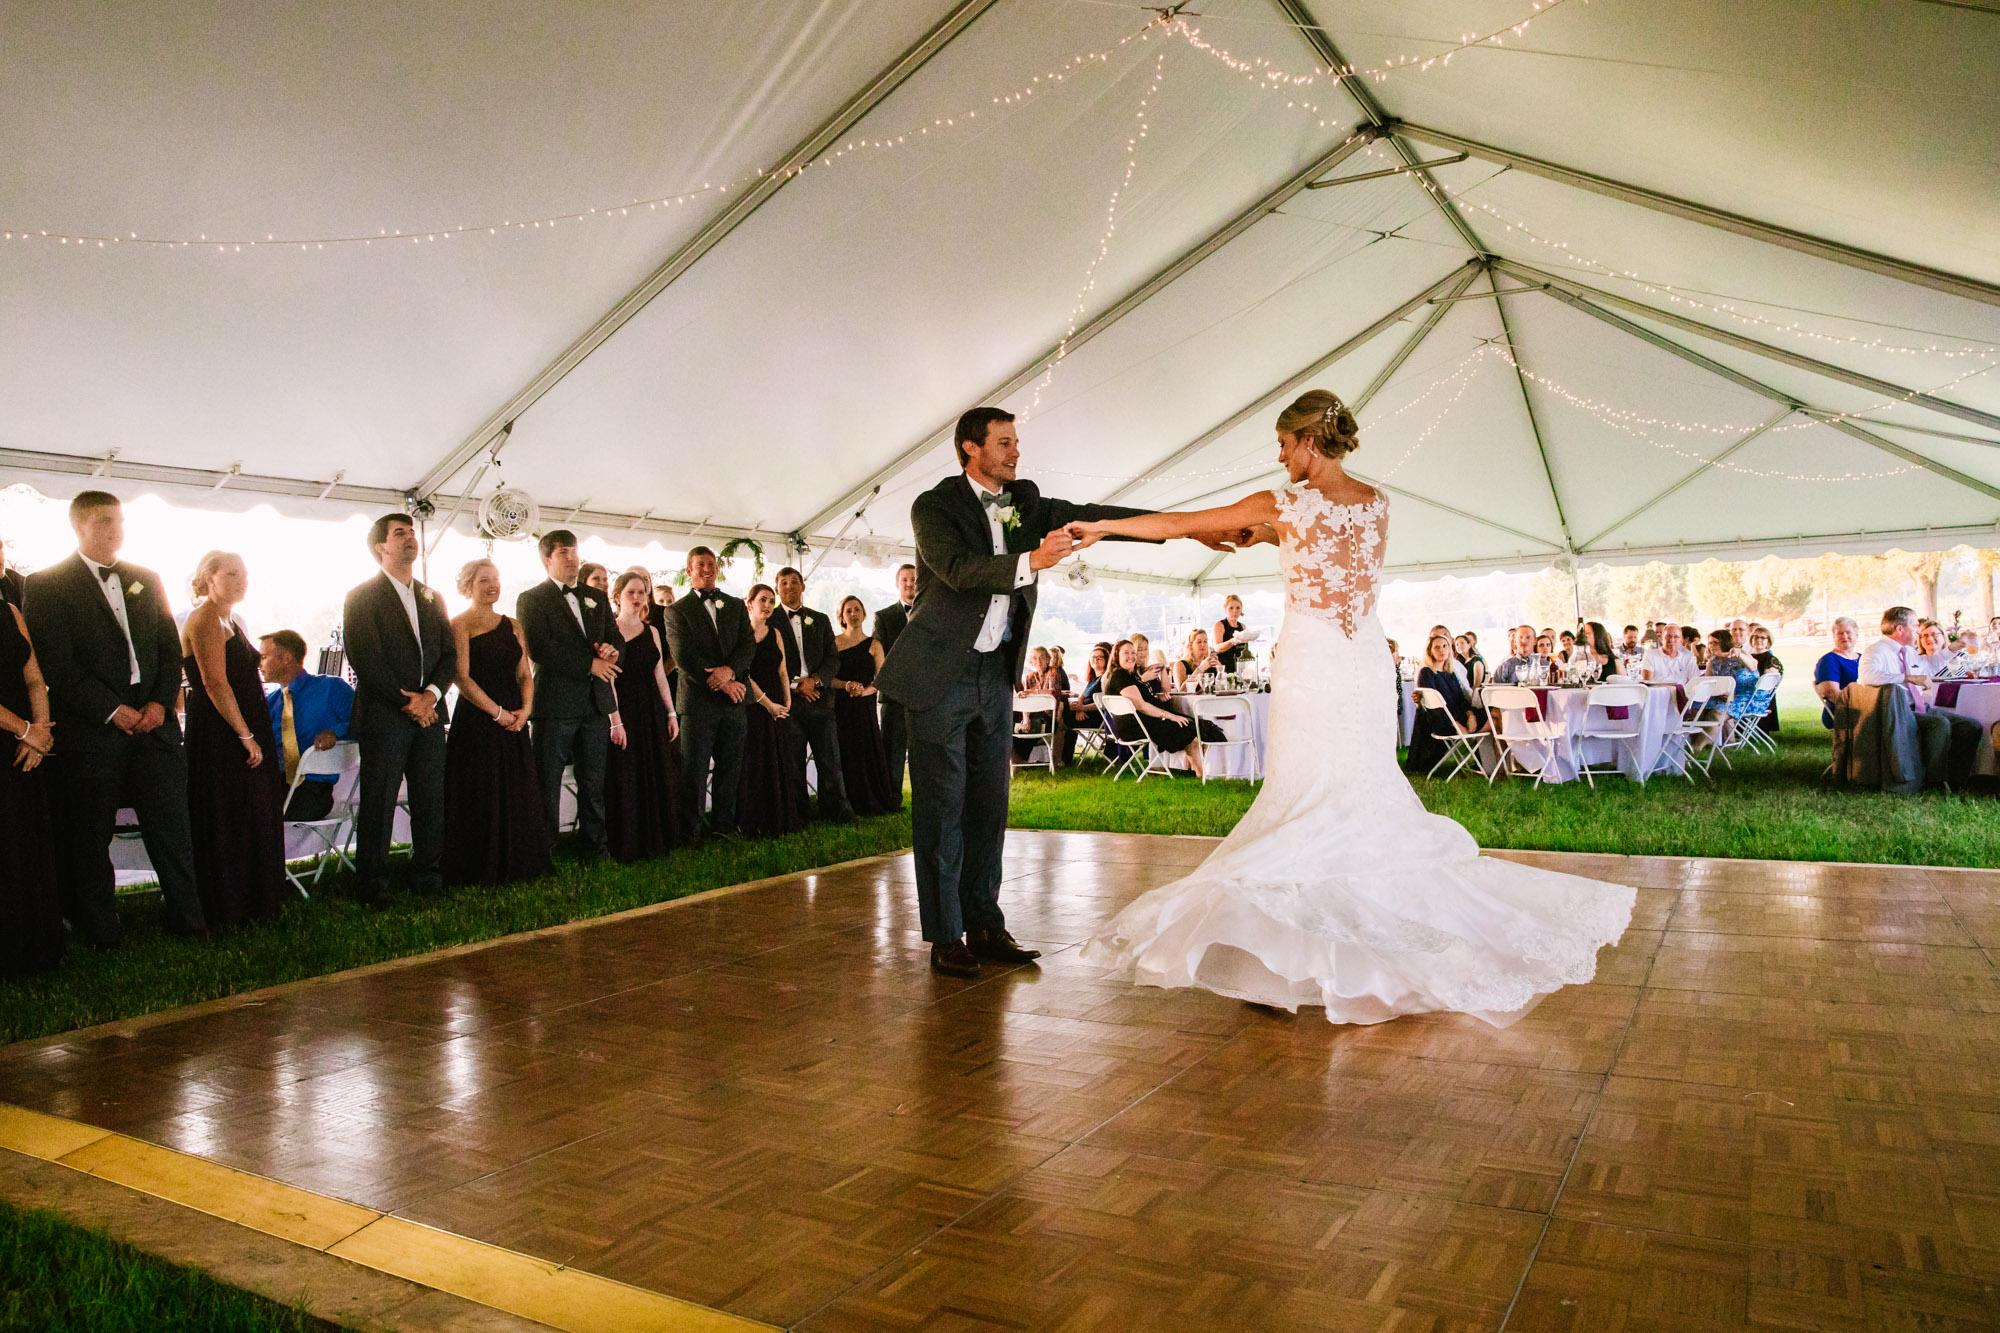 Waynesville, NC Wedding Photography | Bride and Groom First Dance Dress Swirling